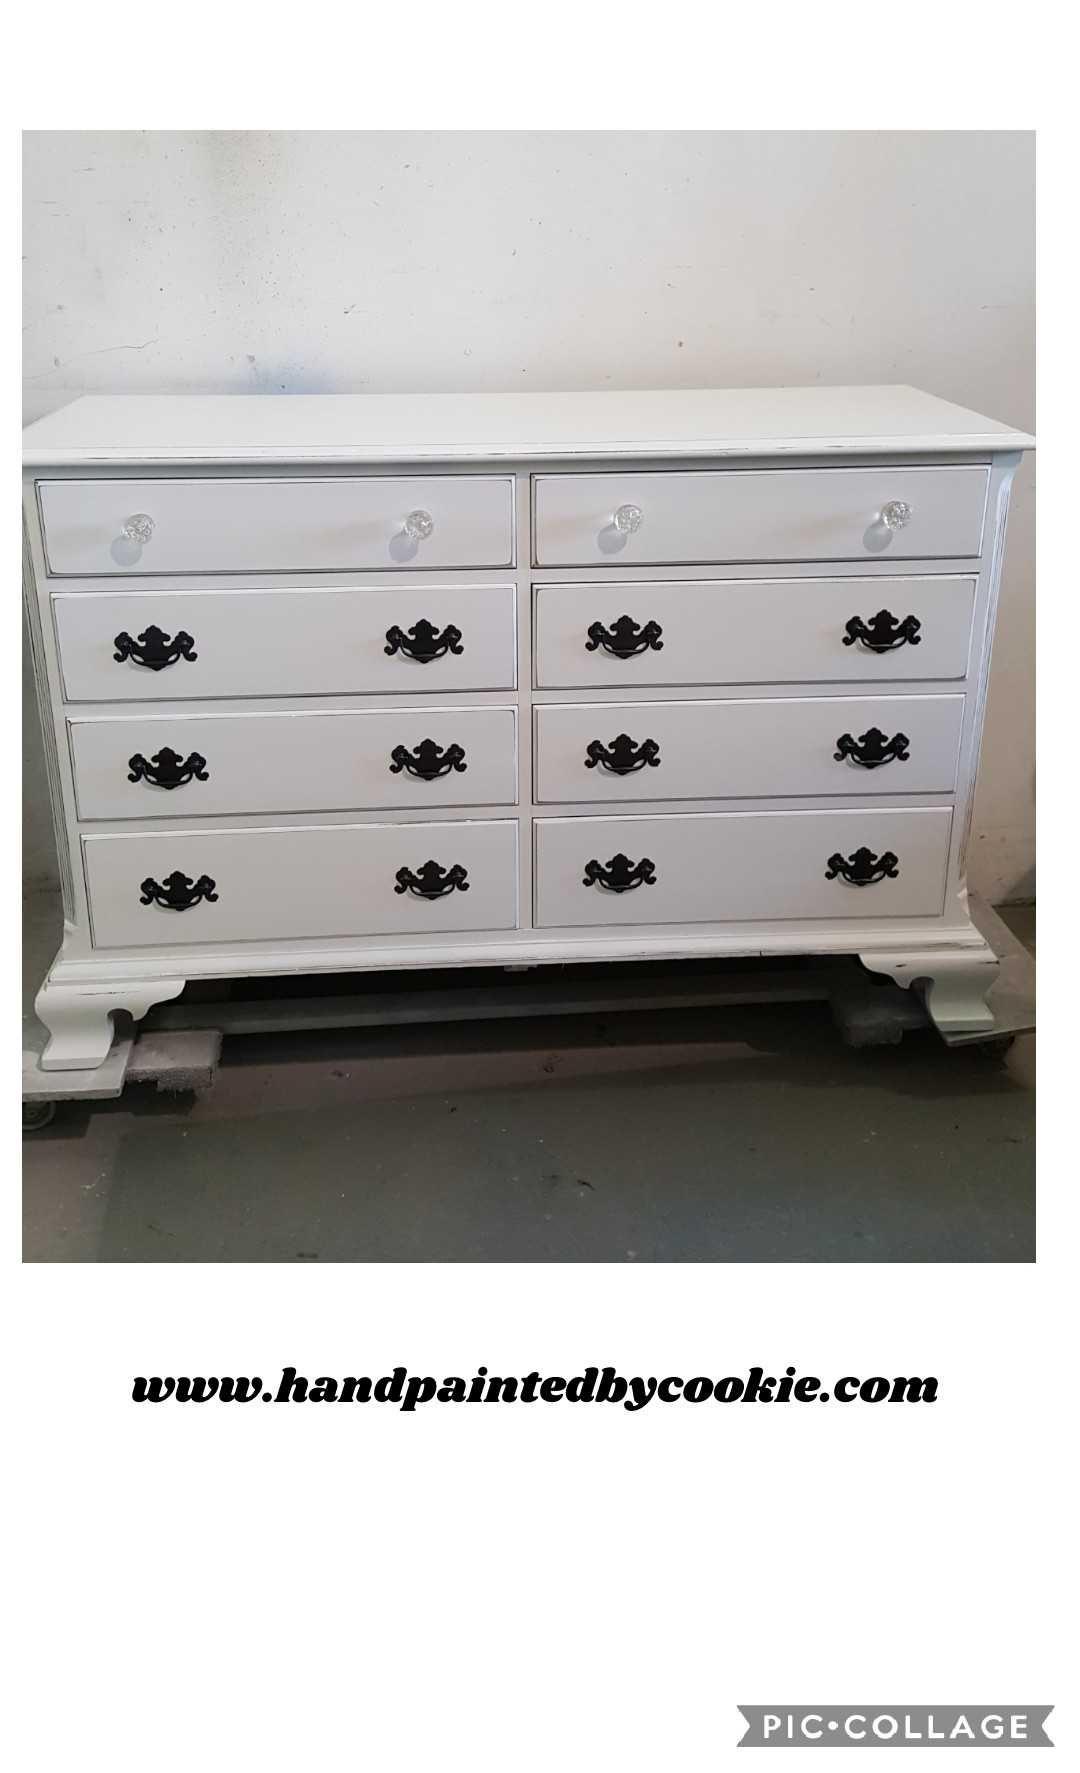 Vintage Painted Distressed And Glazed Bedroom Dresser Chest Furniture White Painted Dressers Dresser Furniture Makeover [ 1773 x 1080 Pixel ]